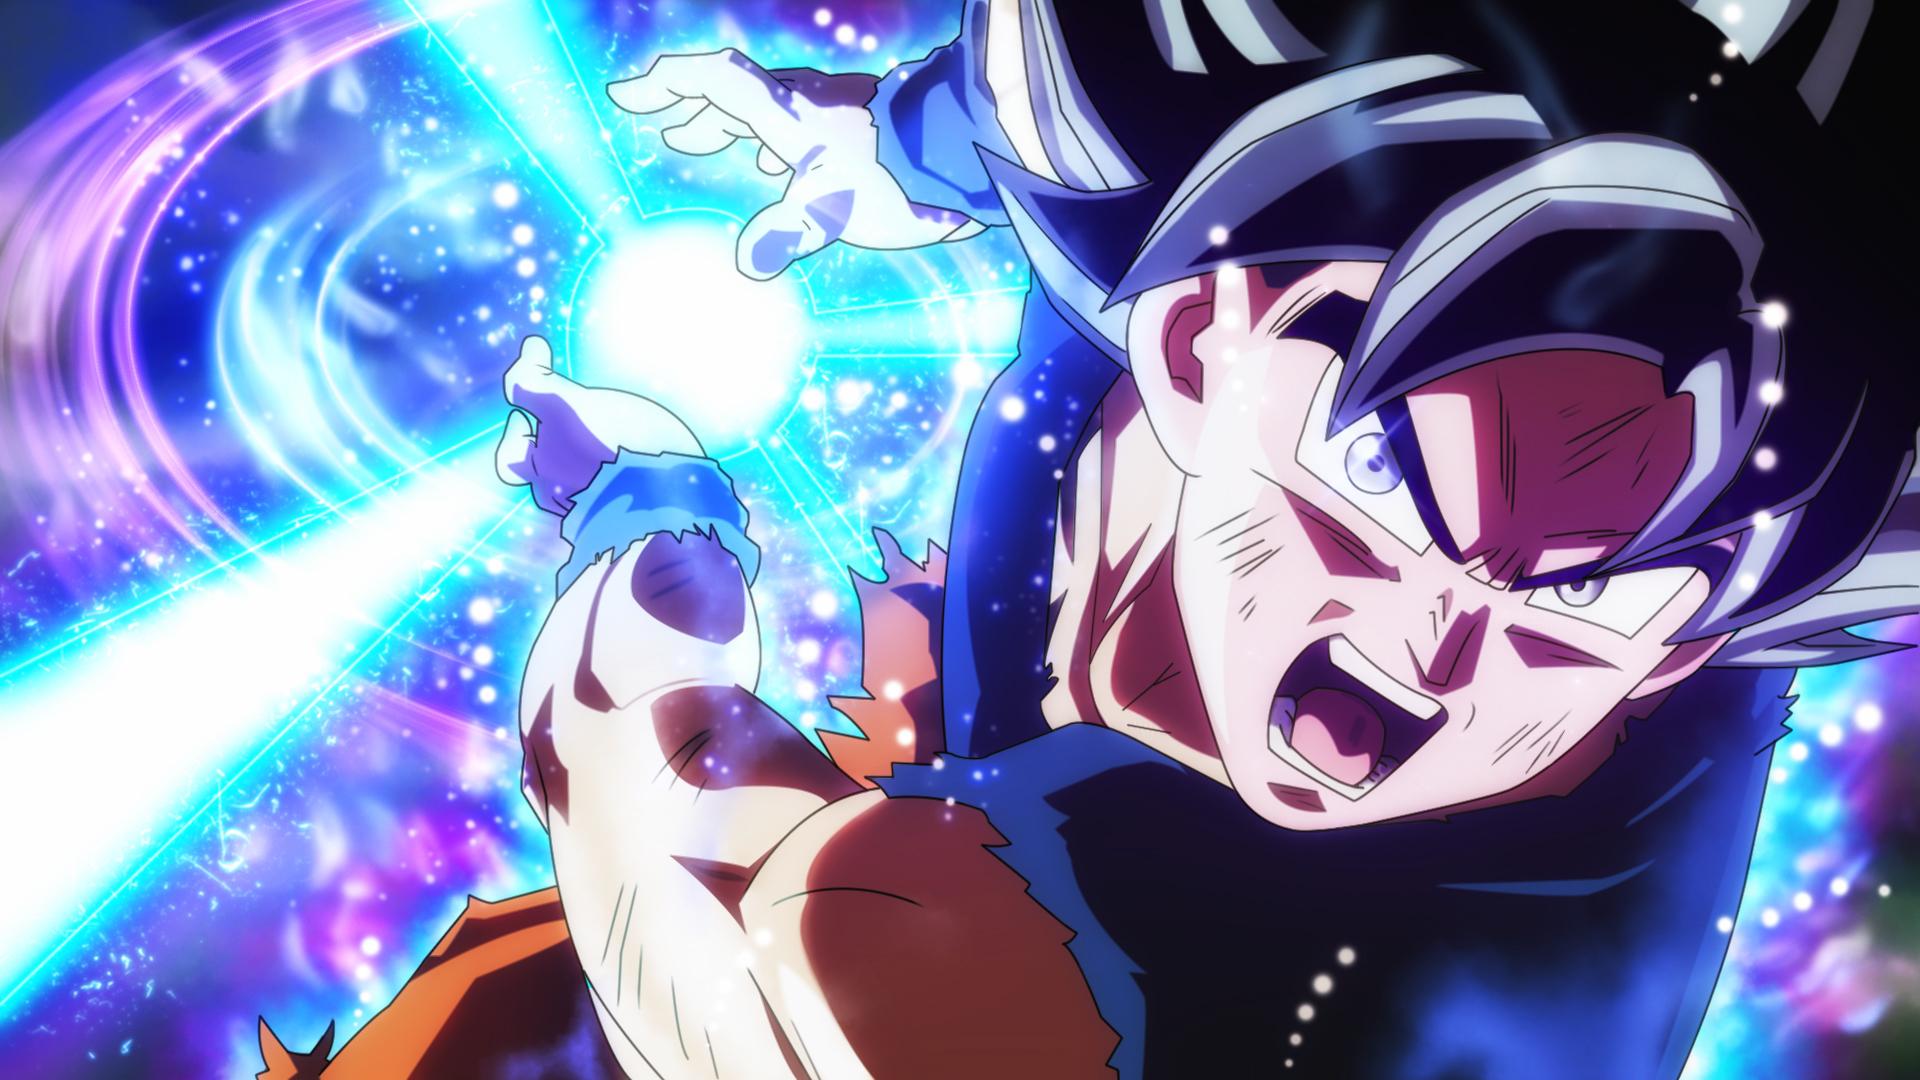 Dragon Ball Super Ultra Instinct Wallpaper: Ultra Instinct Goku Vs Kefla Universal Kamehameha HD